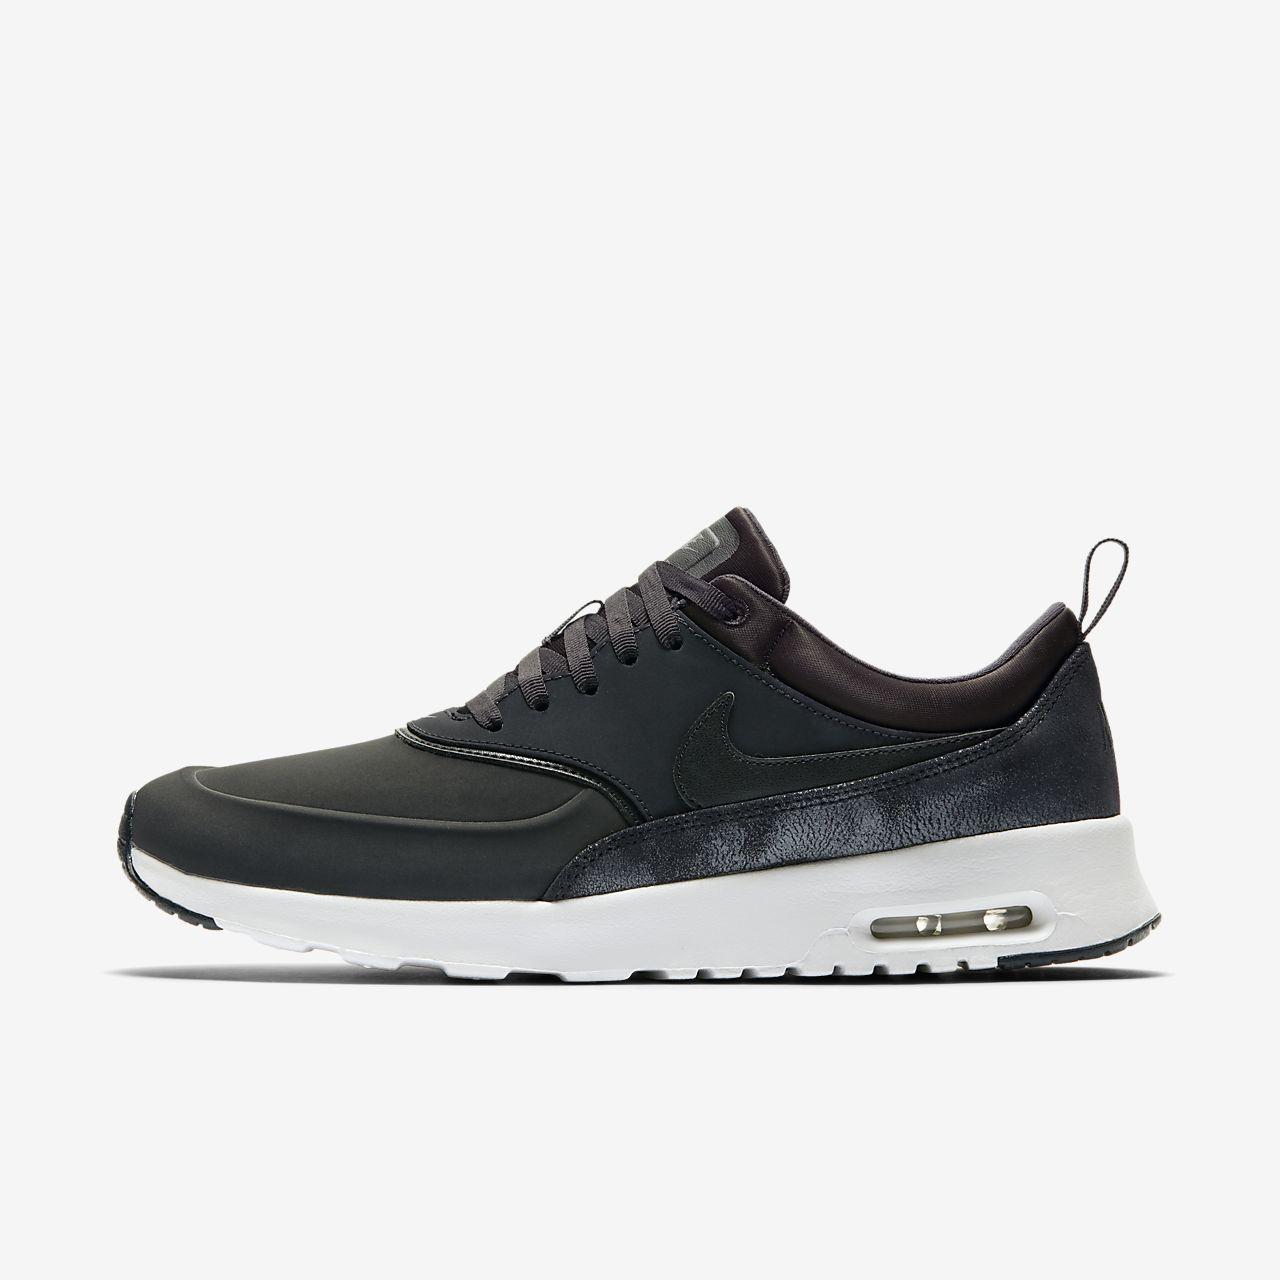 huge discount 15f02 ca73e Nike Air Max Thea Premium